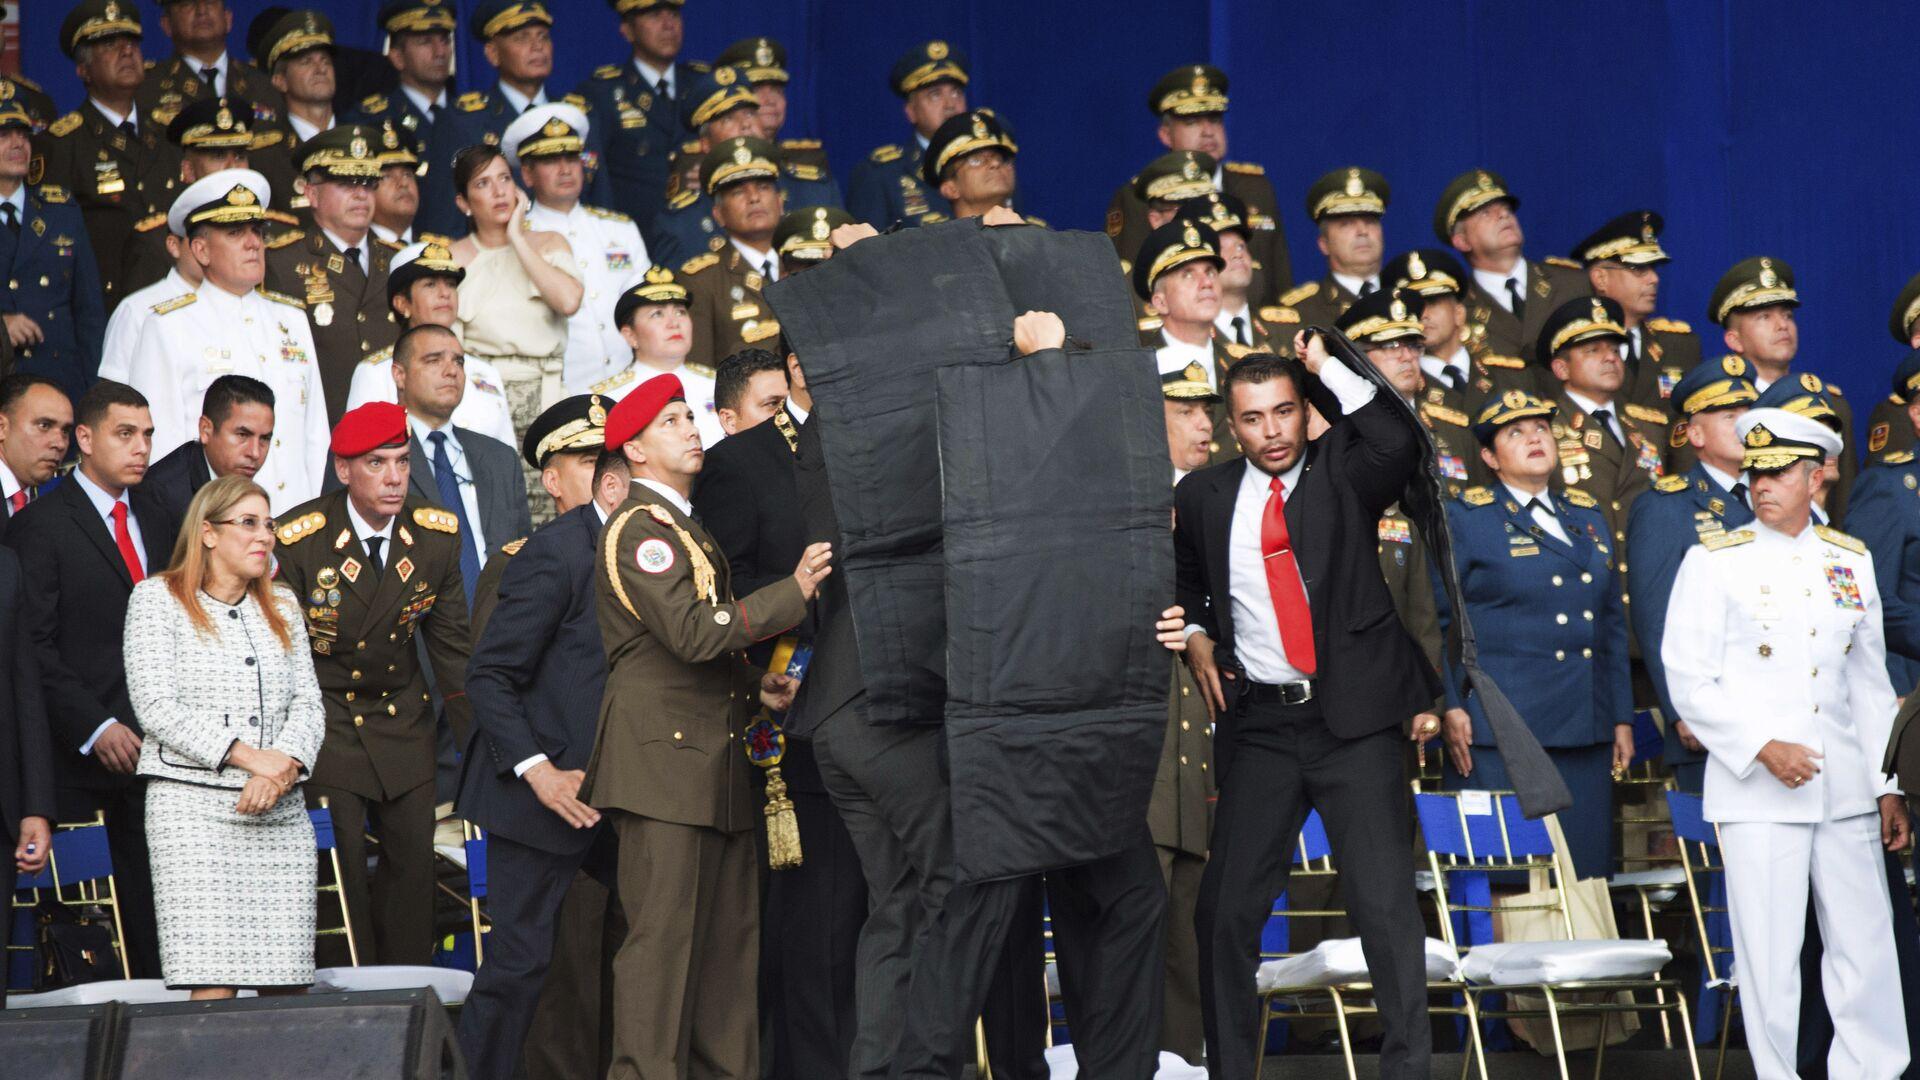 Сотрудники службы безопасности во время покушения на президента Венесуэлы Николаса Мадуро. 4 августа 2018 - РИА Новости, 1920, 14.07.2021